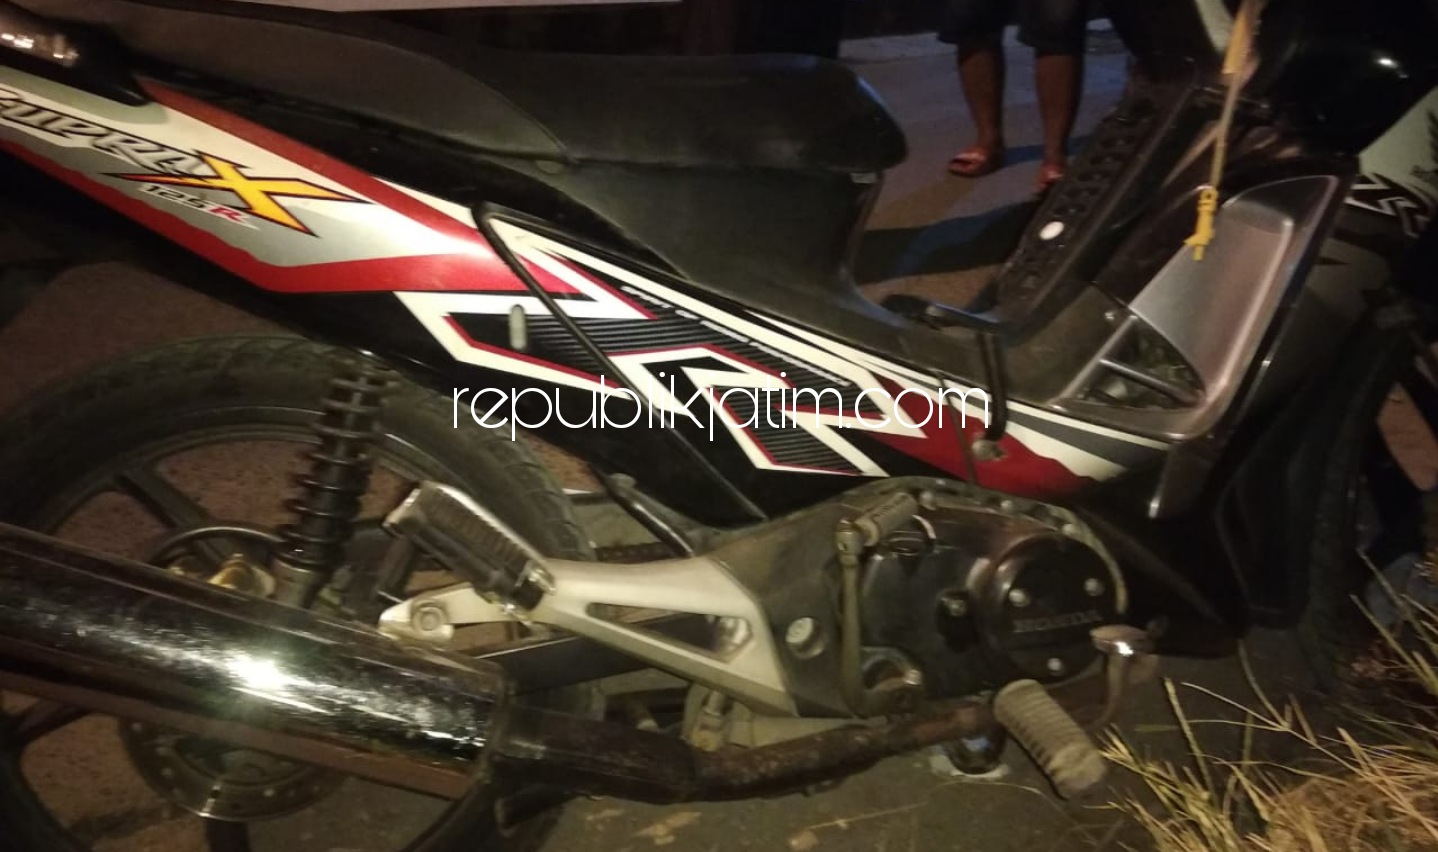 Pengendara Motor Asal Surabaya Terkejut Tanjakan, Jatuh Tersungkur Tewas